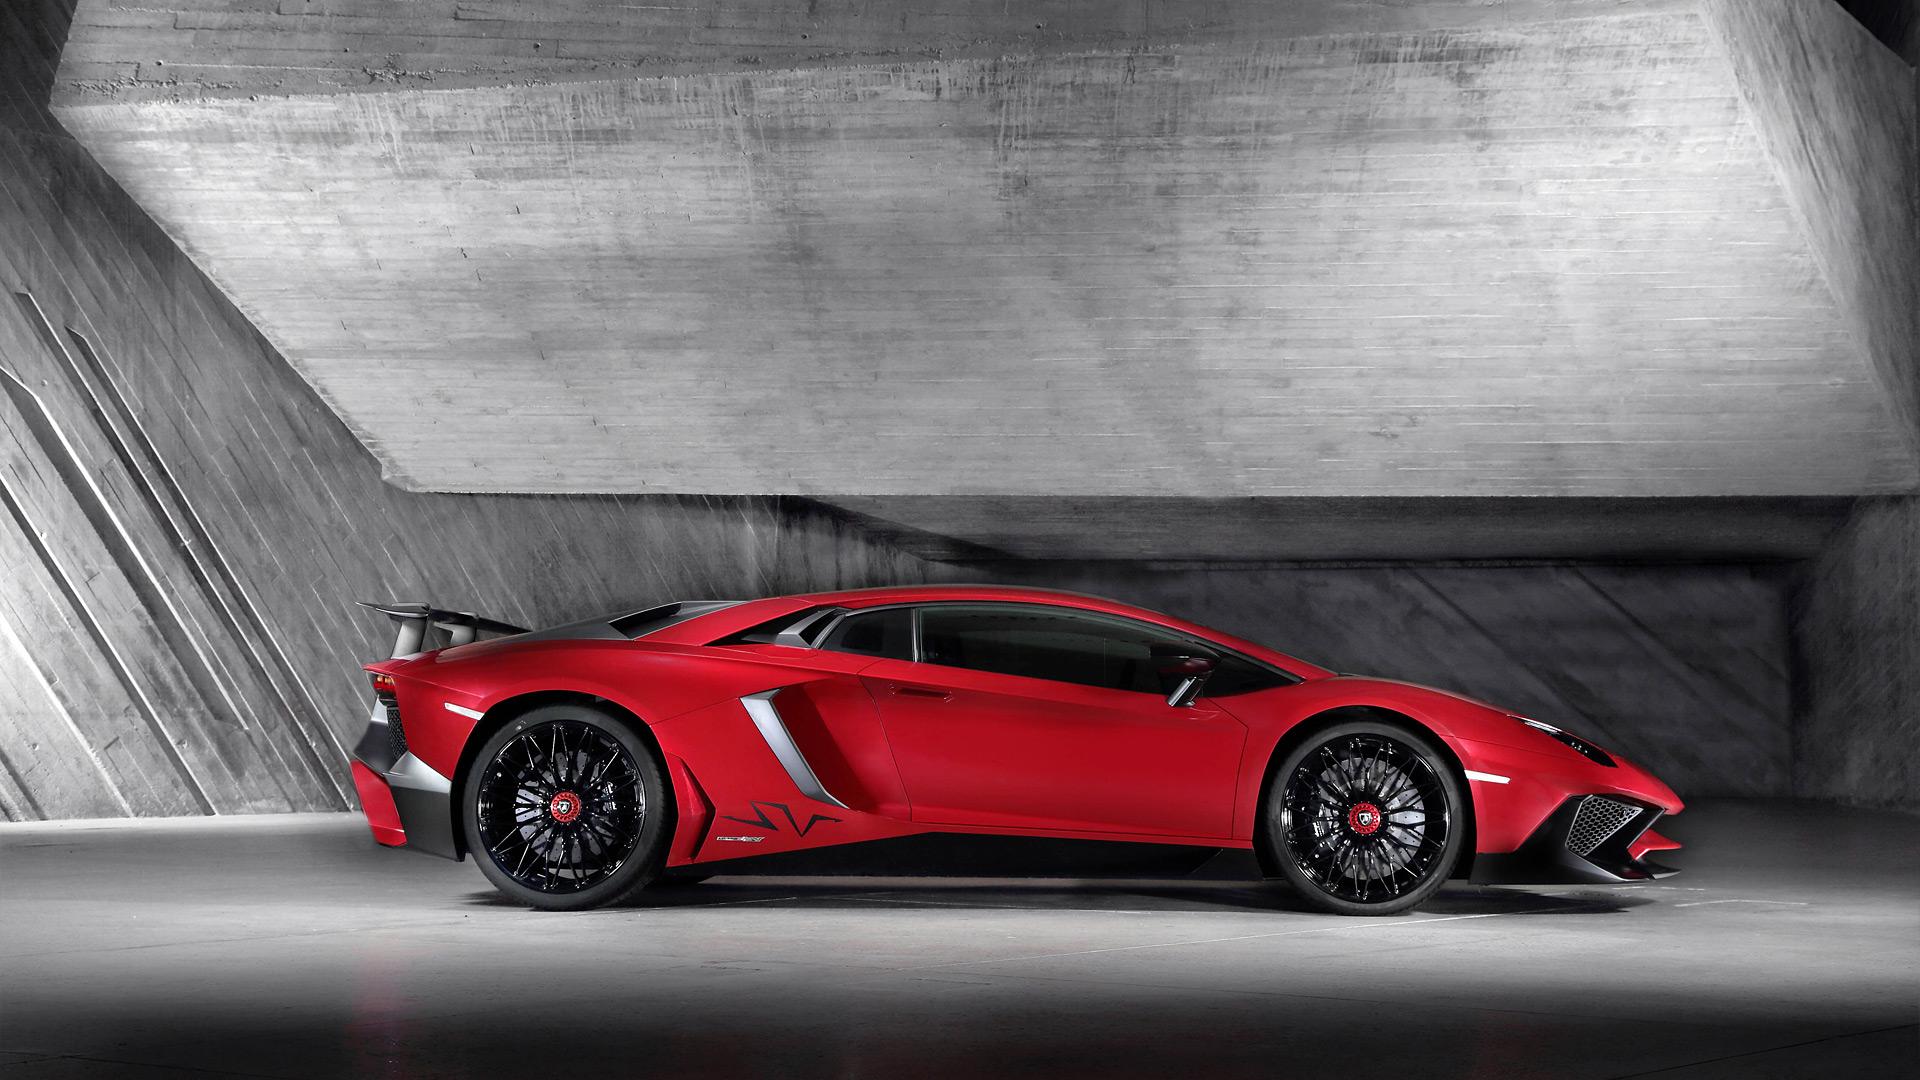 Lamborghini-Aventador-LP750-4-SV – 02